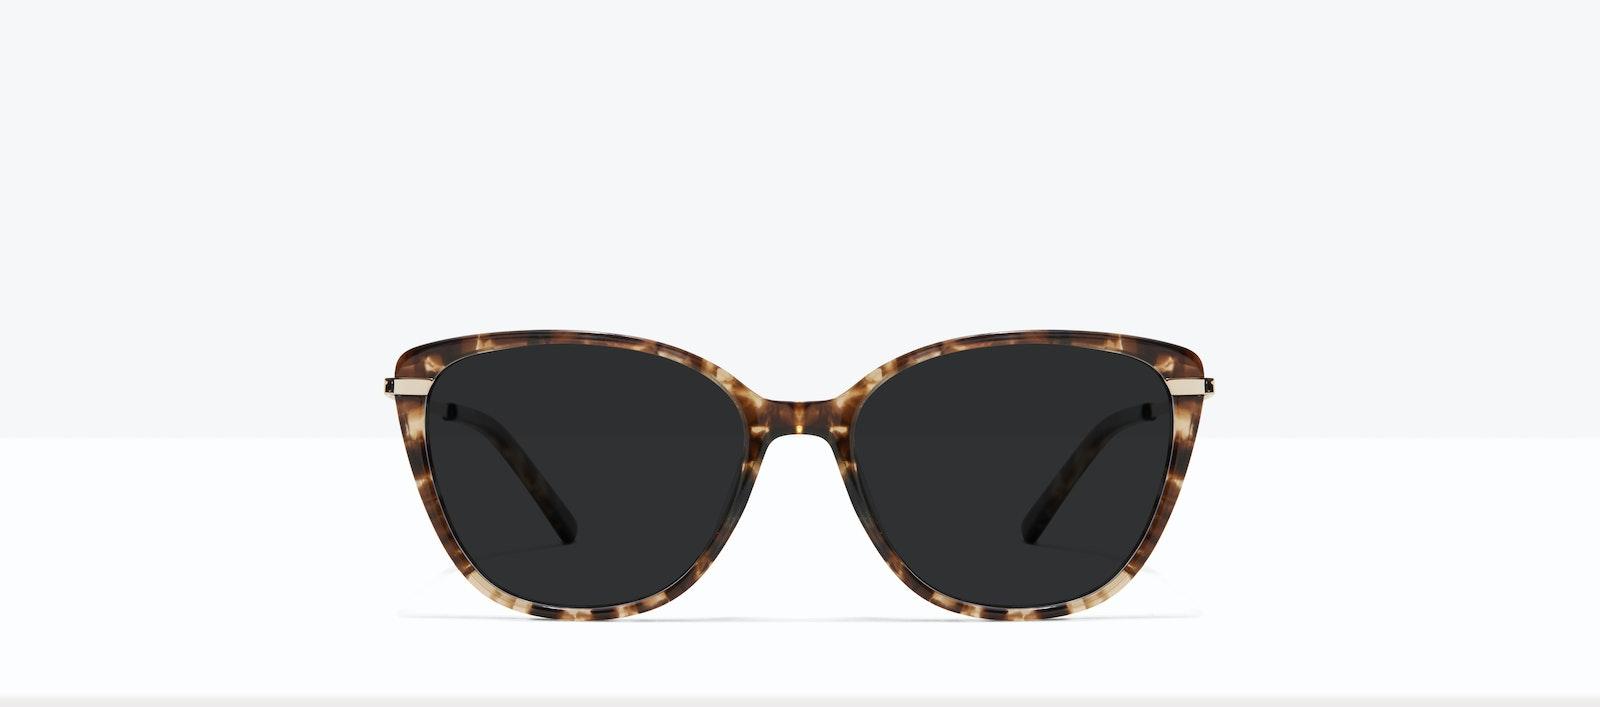 Affordable Fashion Glasses Rectangle Square Sunglasses Women Illusion L Leopard Front